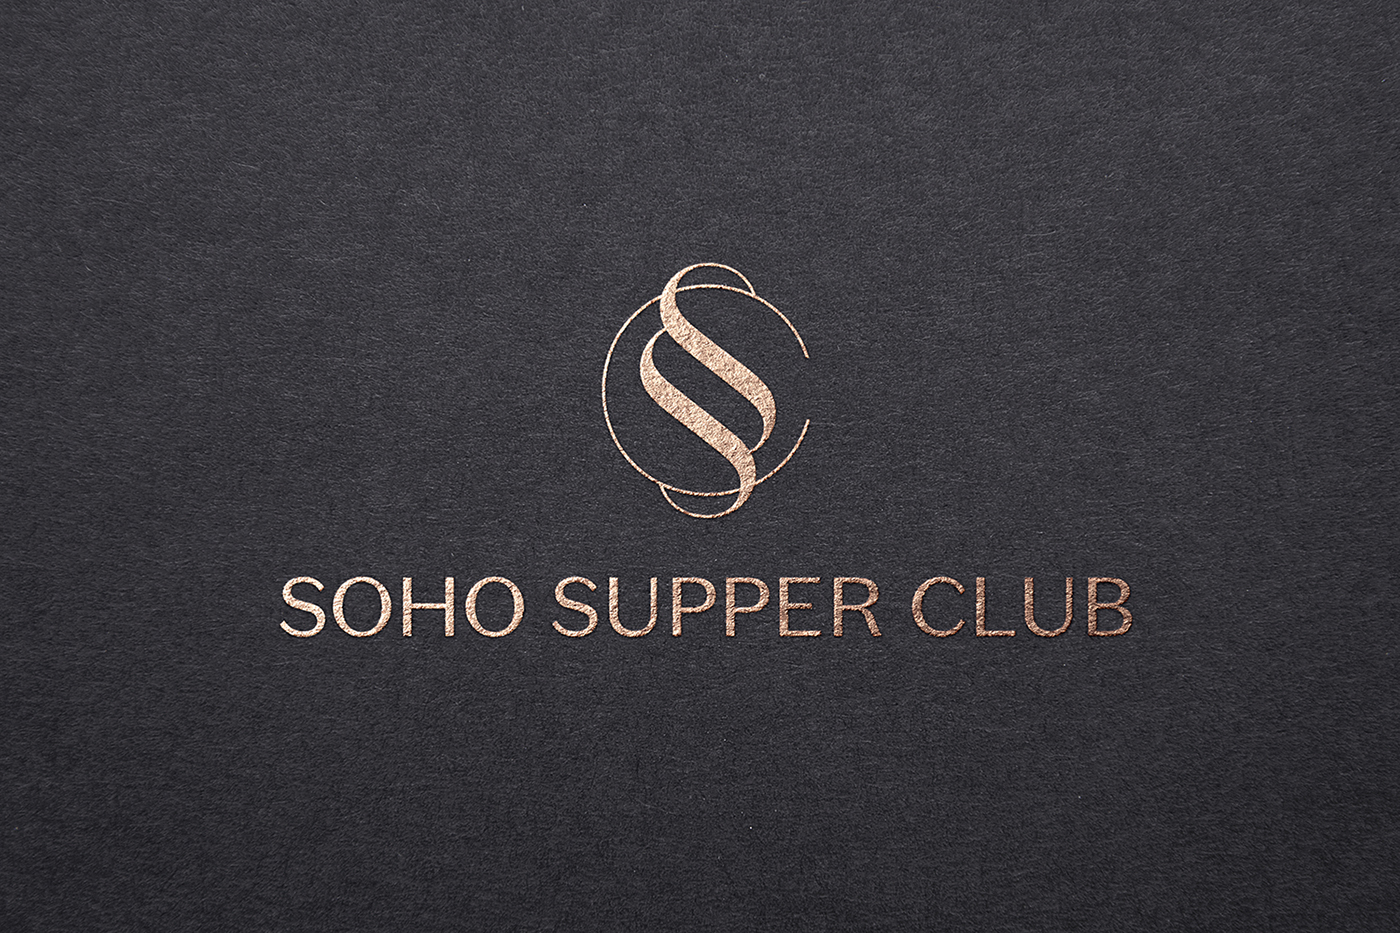 sohosupperclub